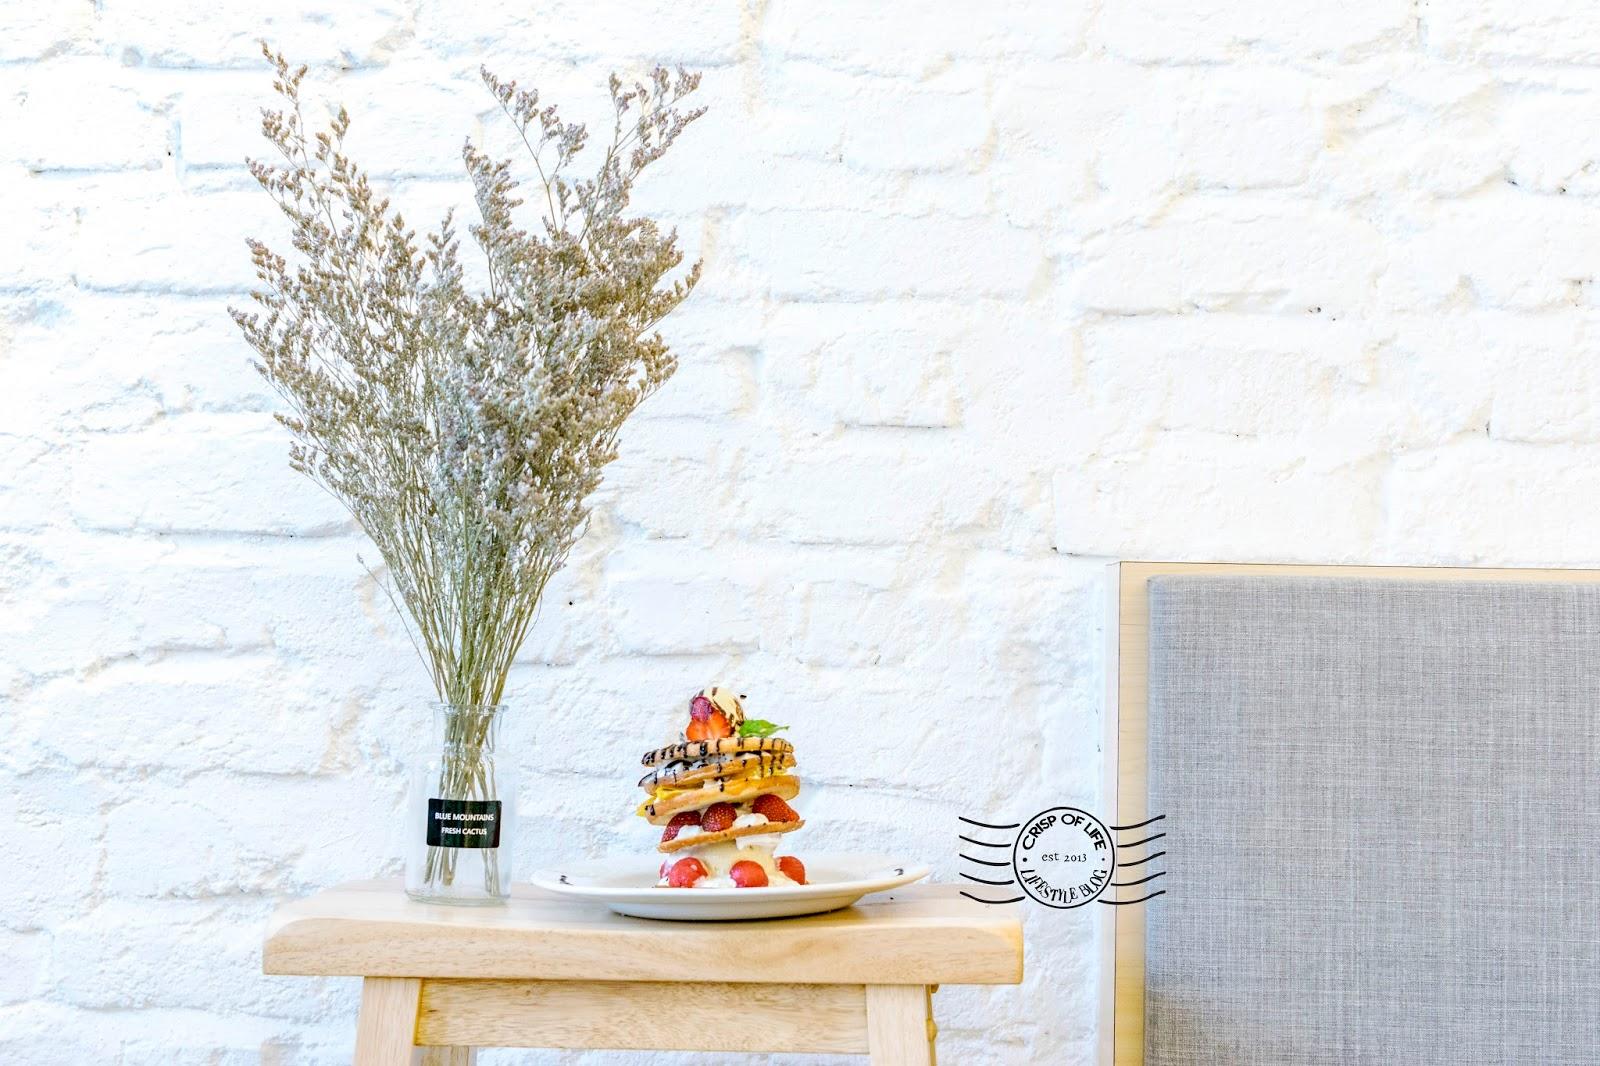 The Craftisan Cafe's New Dessert